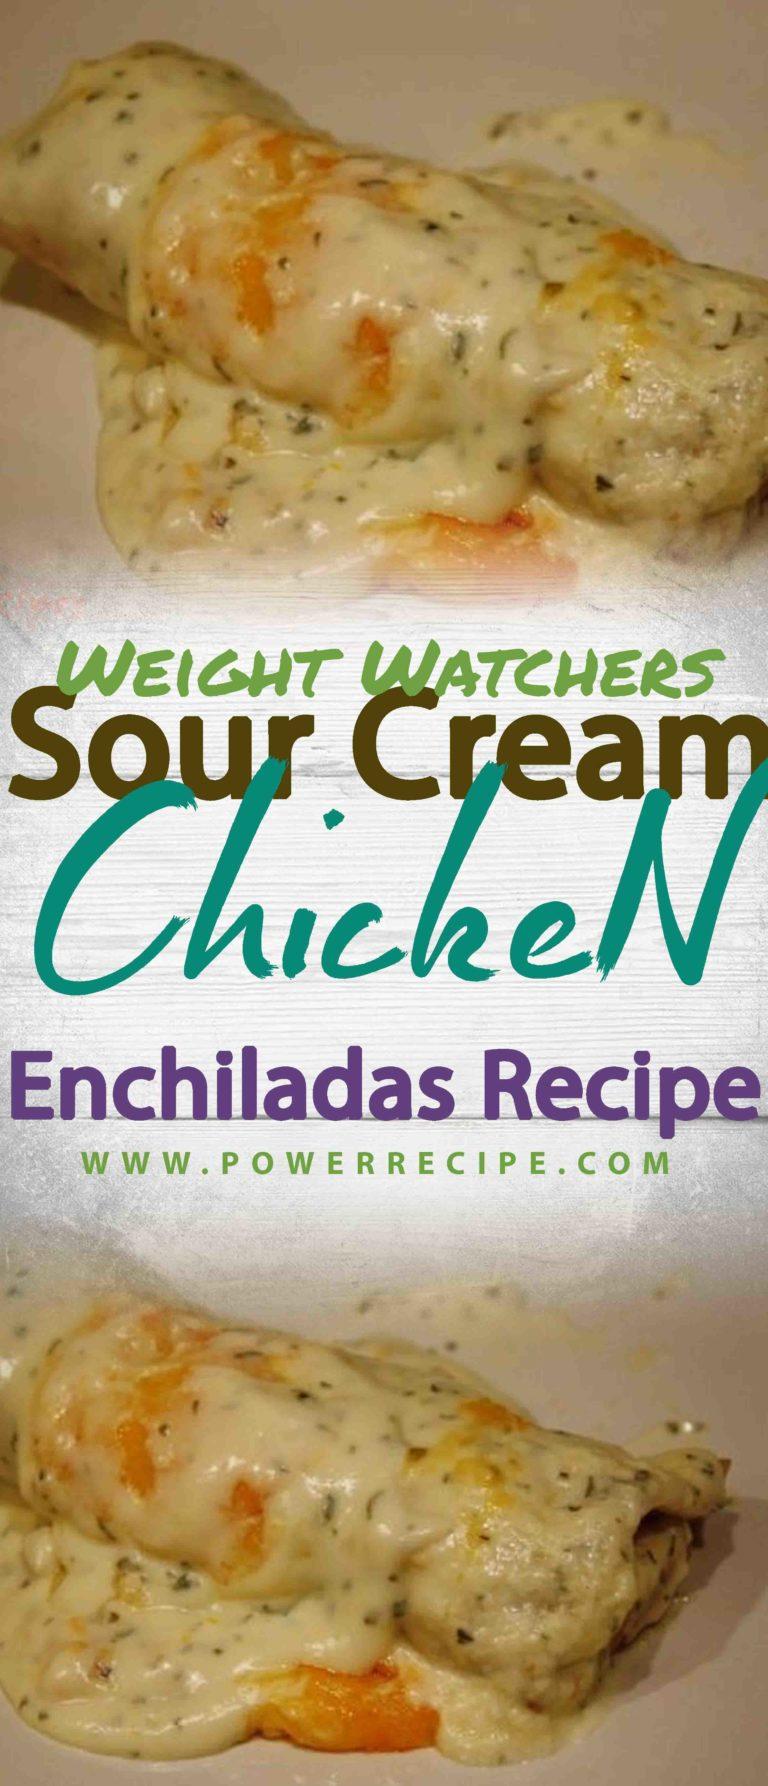 Sour Cream Chicken Enchiladas Recipe Page 2 All About Your Power Recipes Enchilada Recipes Sour Cream Chicken Enchilada Recipe Chicken Enchilada Recipe